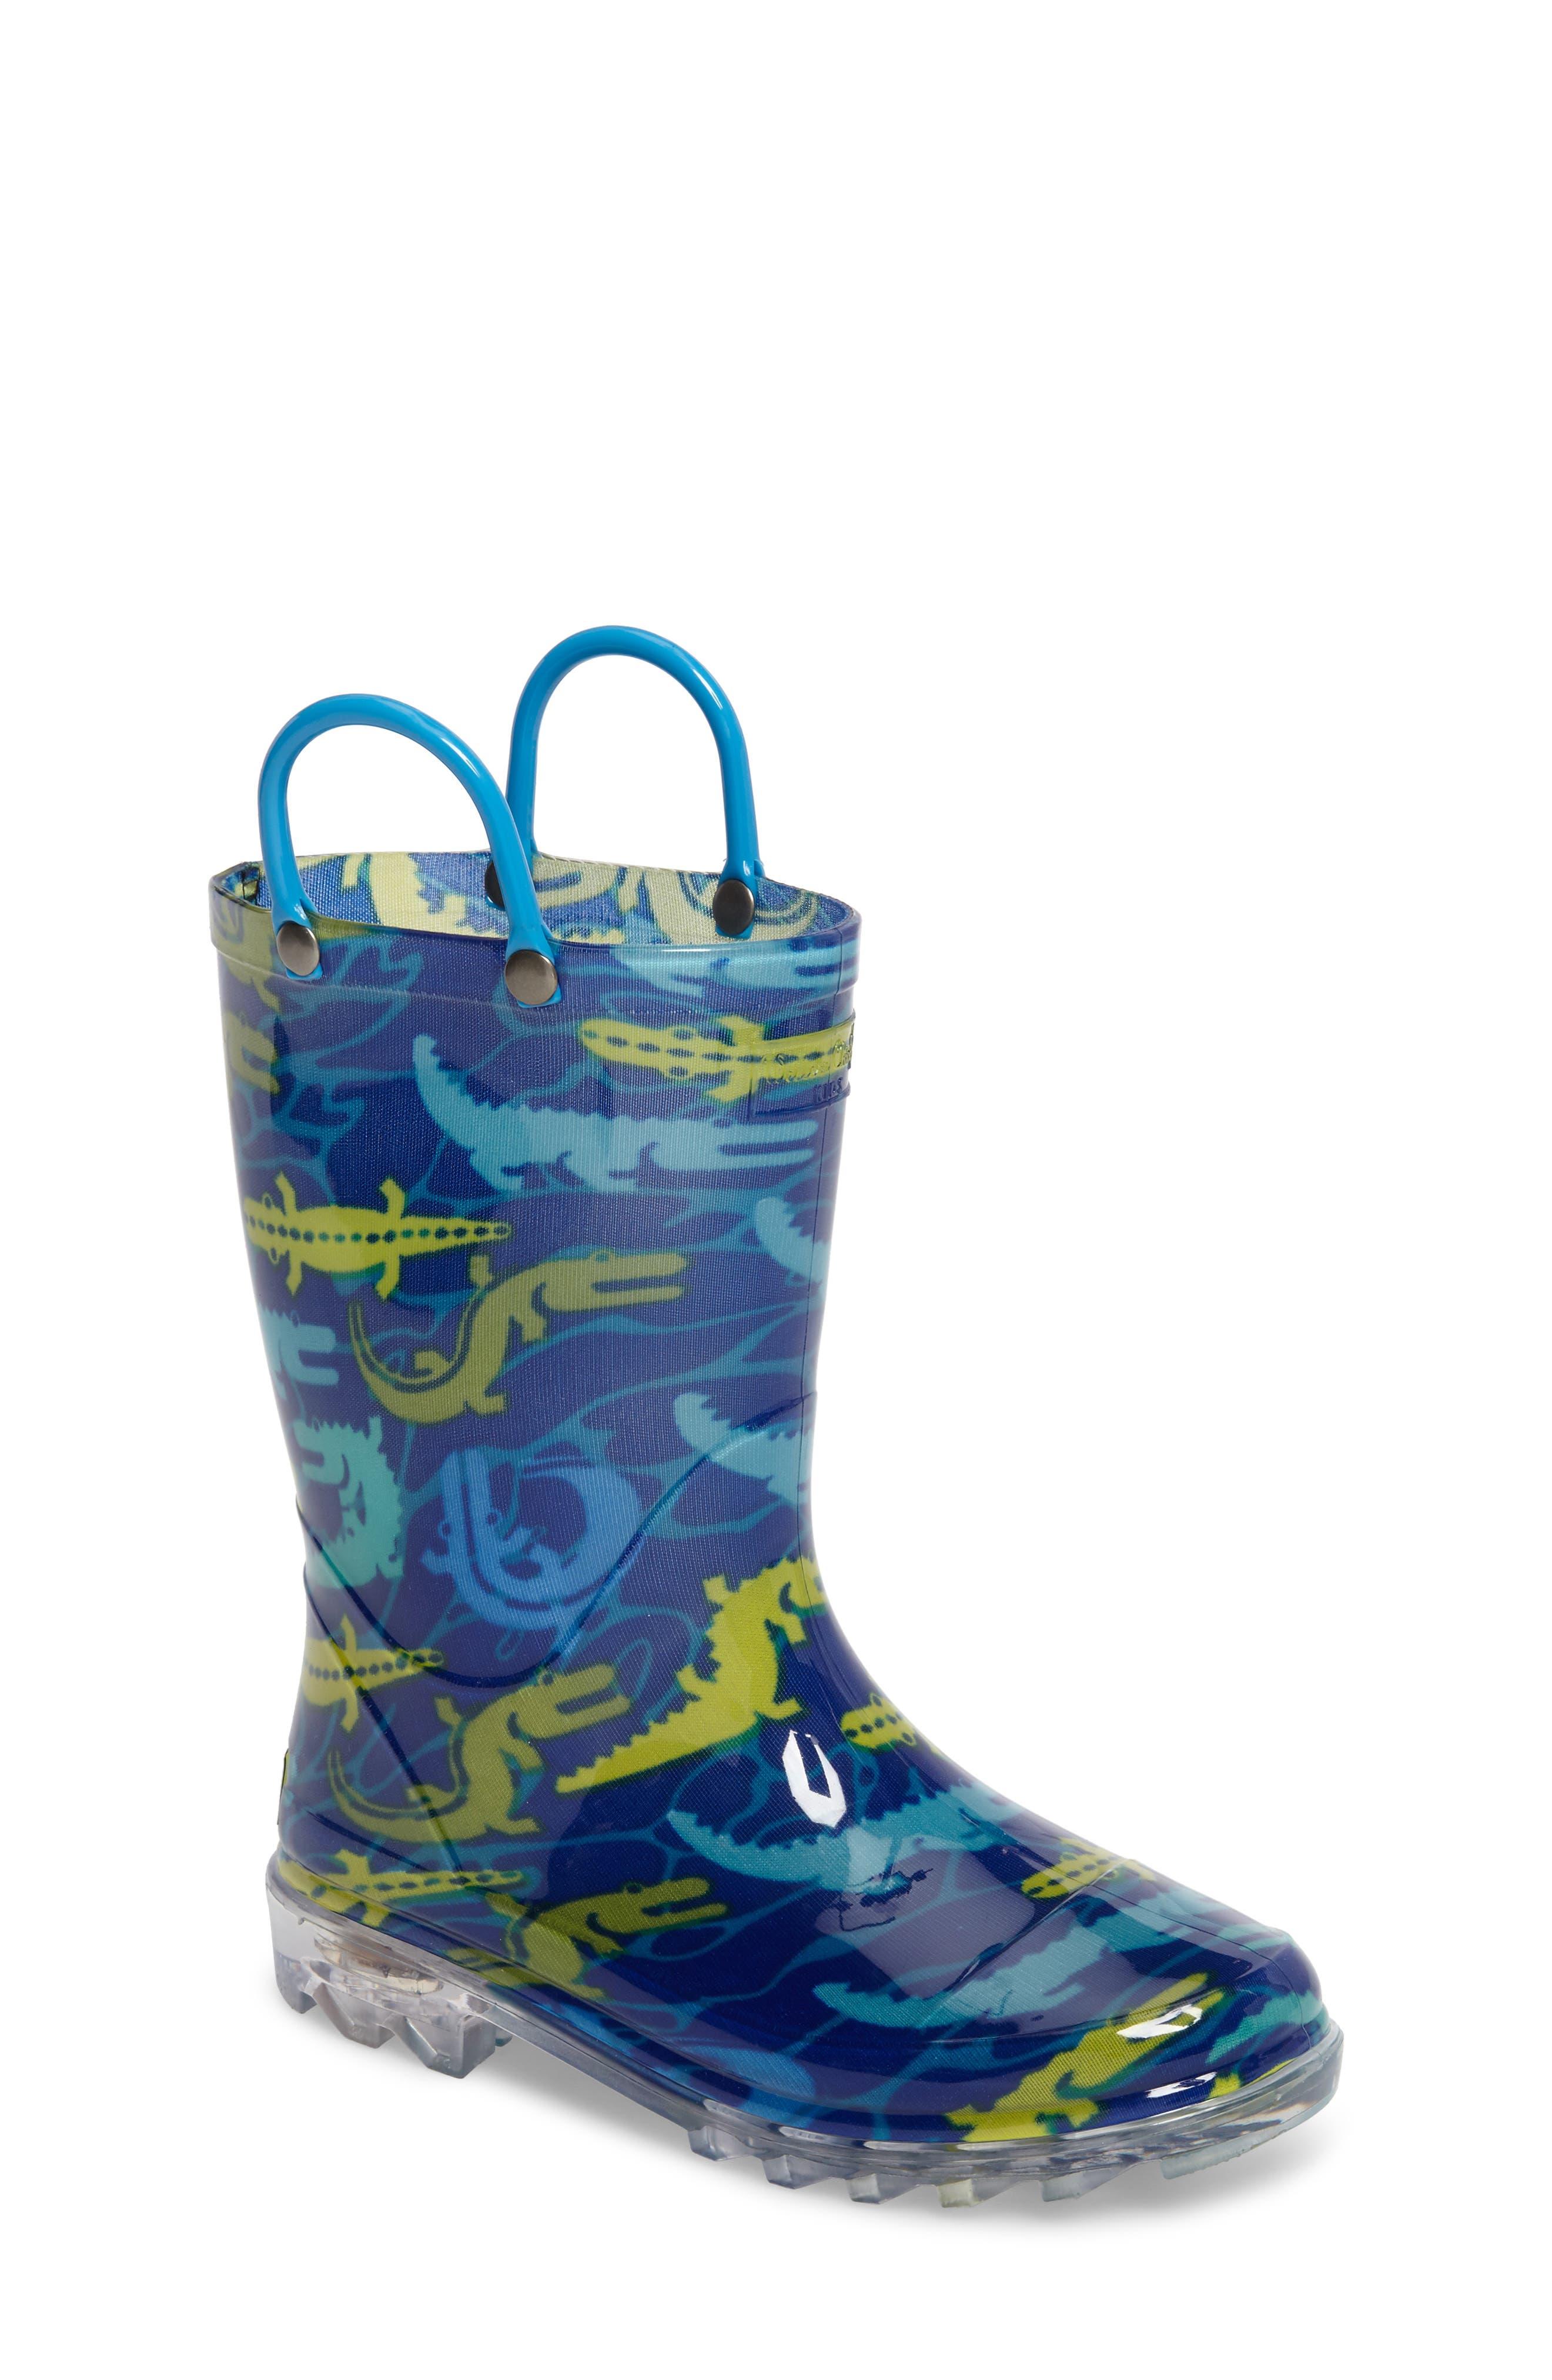 Gators Galore Light-Up Rain Boot,                         Main,                         color, 421